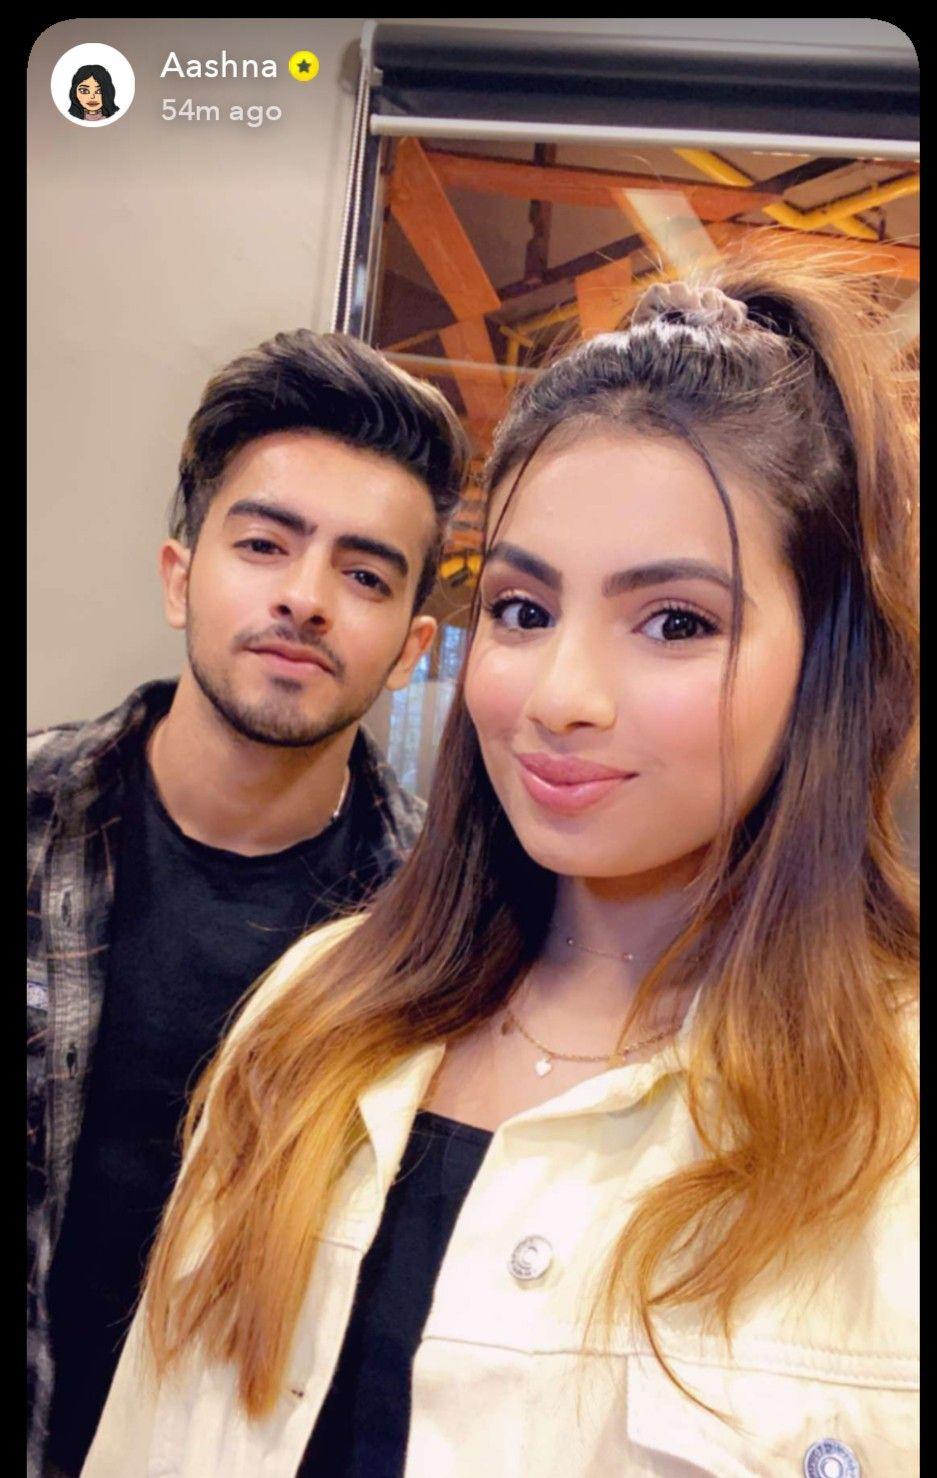 #Aasan in 2020 | Cute girl pic, Bff goals, Instagram models